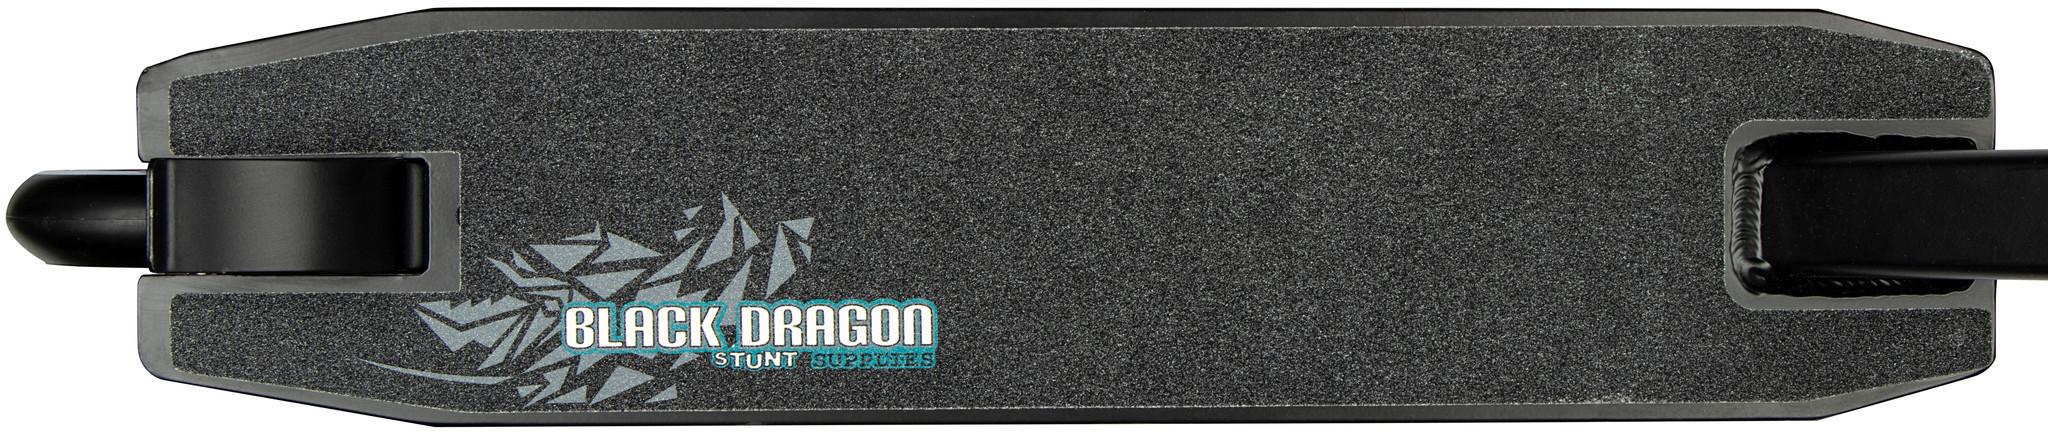 BLACK DRAGON BLACK DRAGON NEO CHROMAGNON